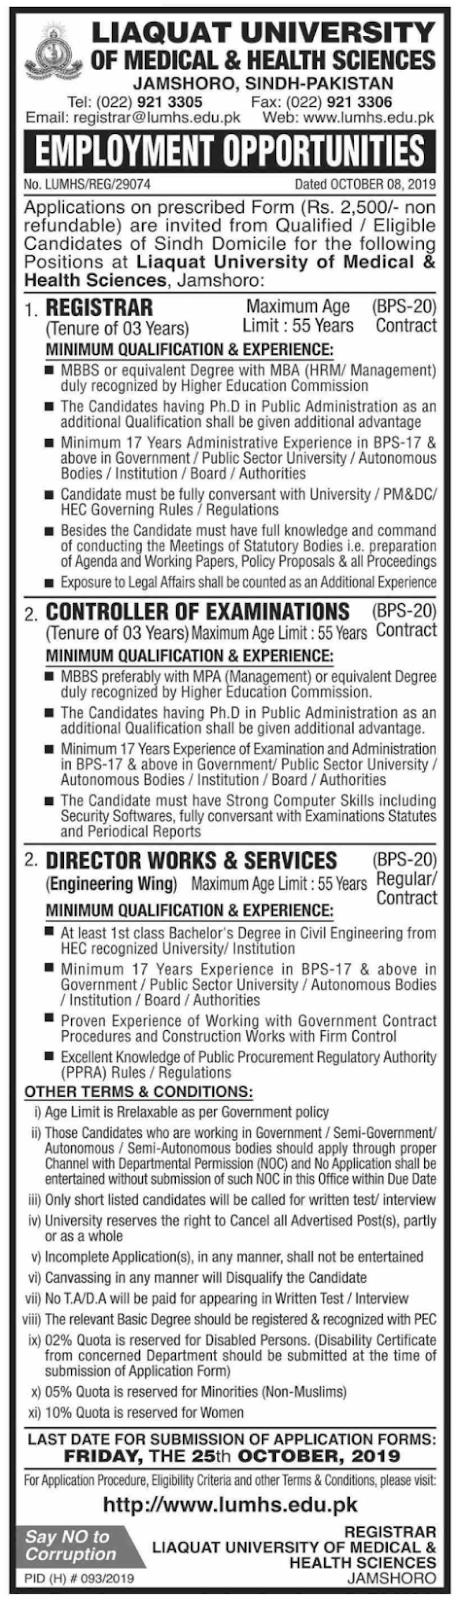 Liaquat University of Medical & Health Sciences LUMHS Jobs 2019 Sindh